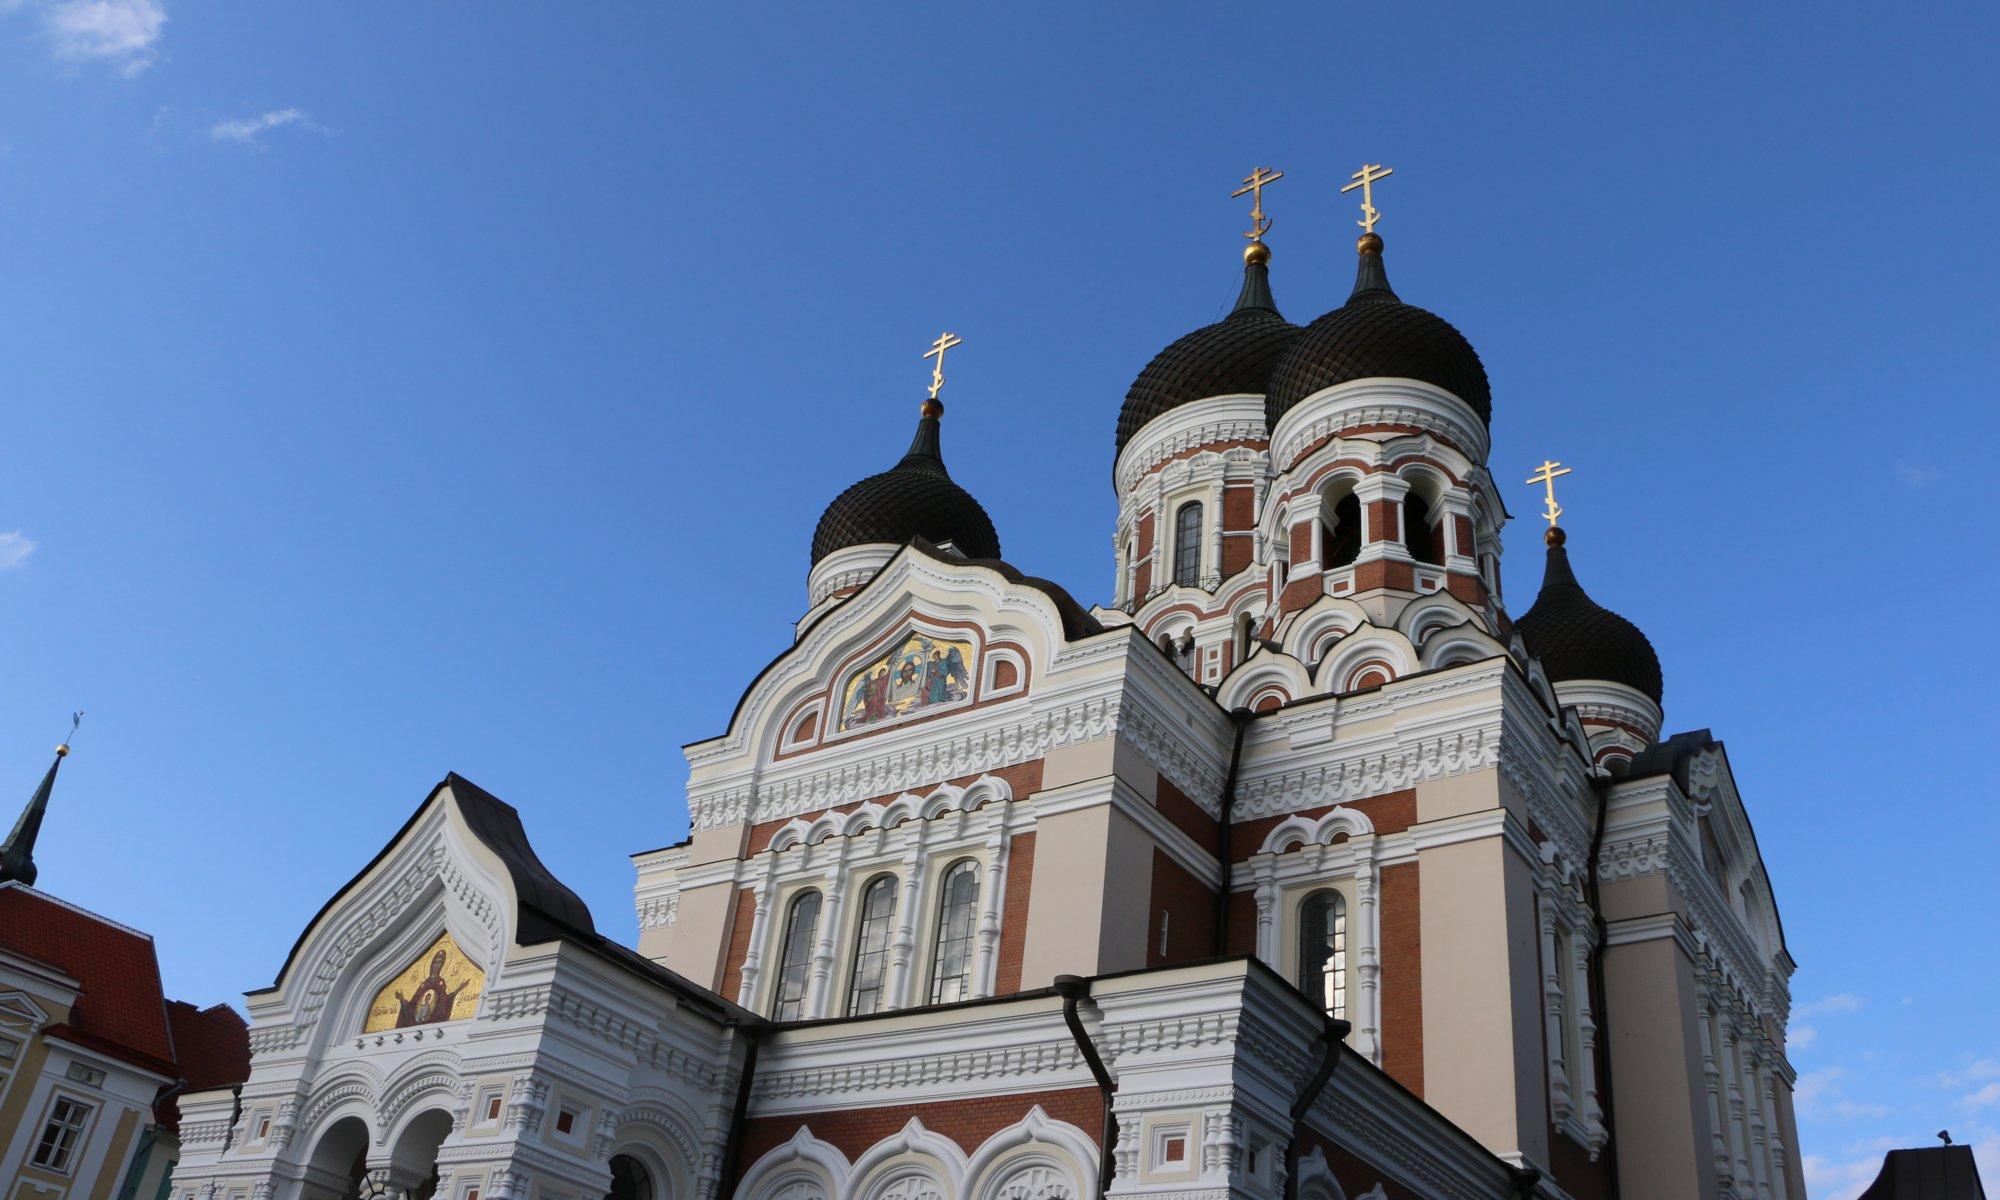 leksander Nevski katedraal, Tallinn